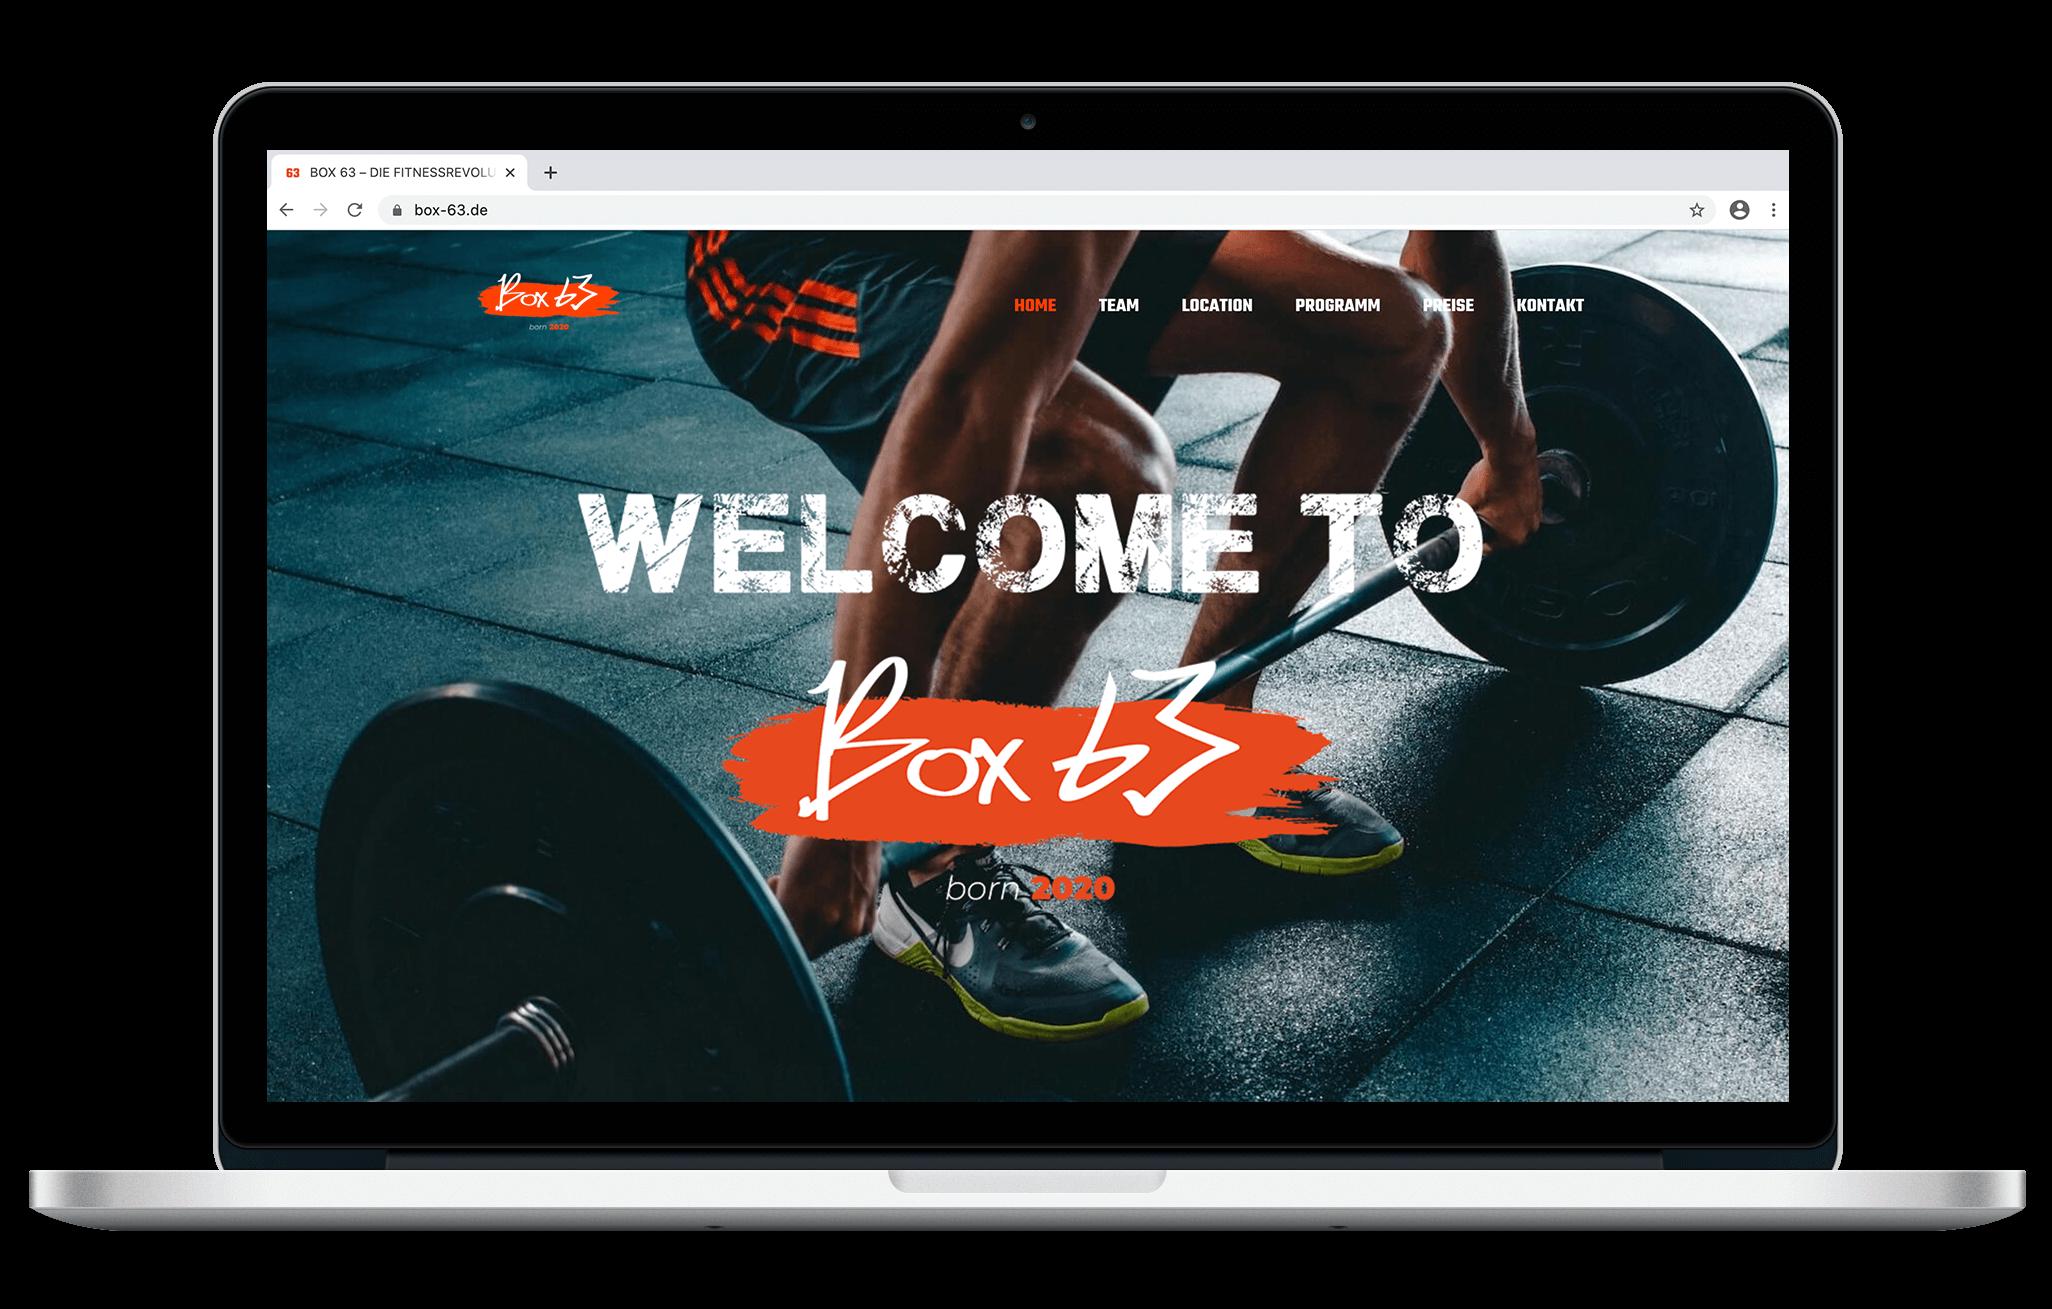 Box 63 | Webdesign